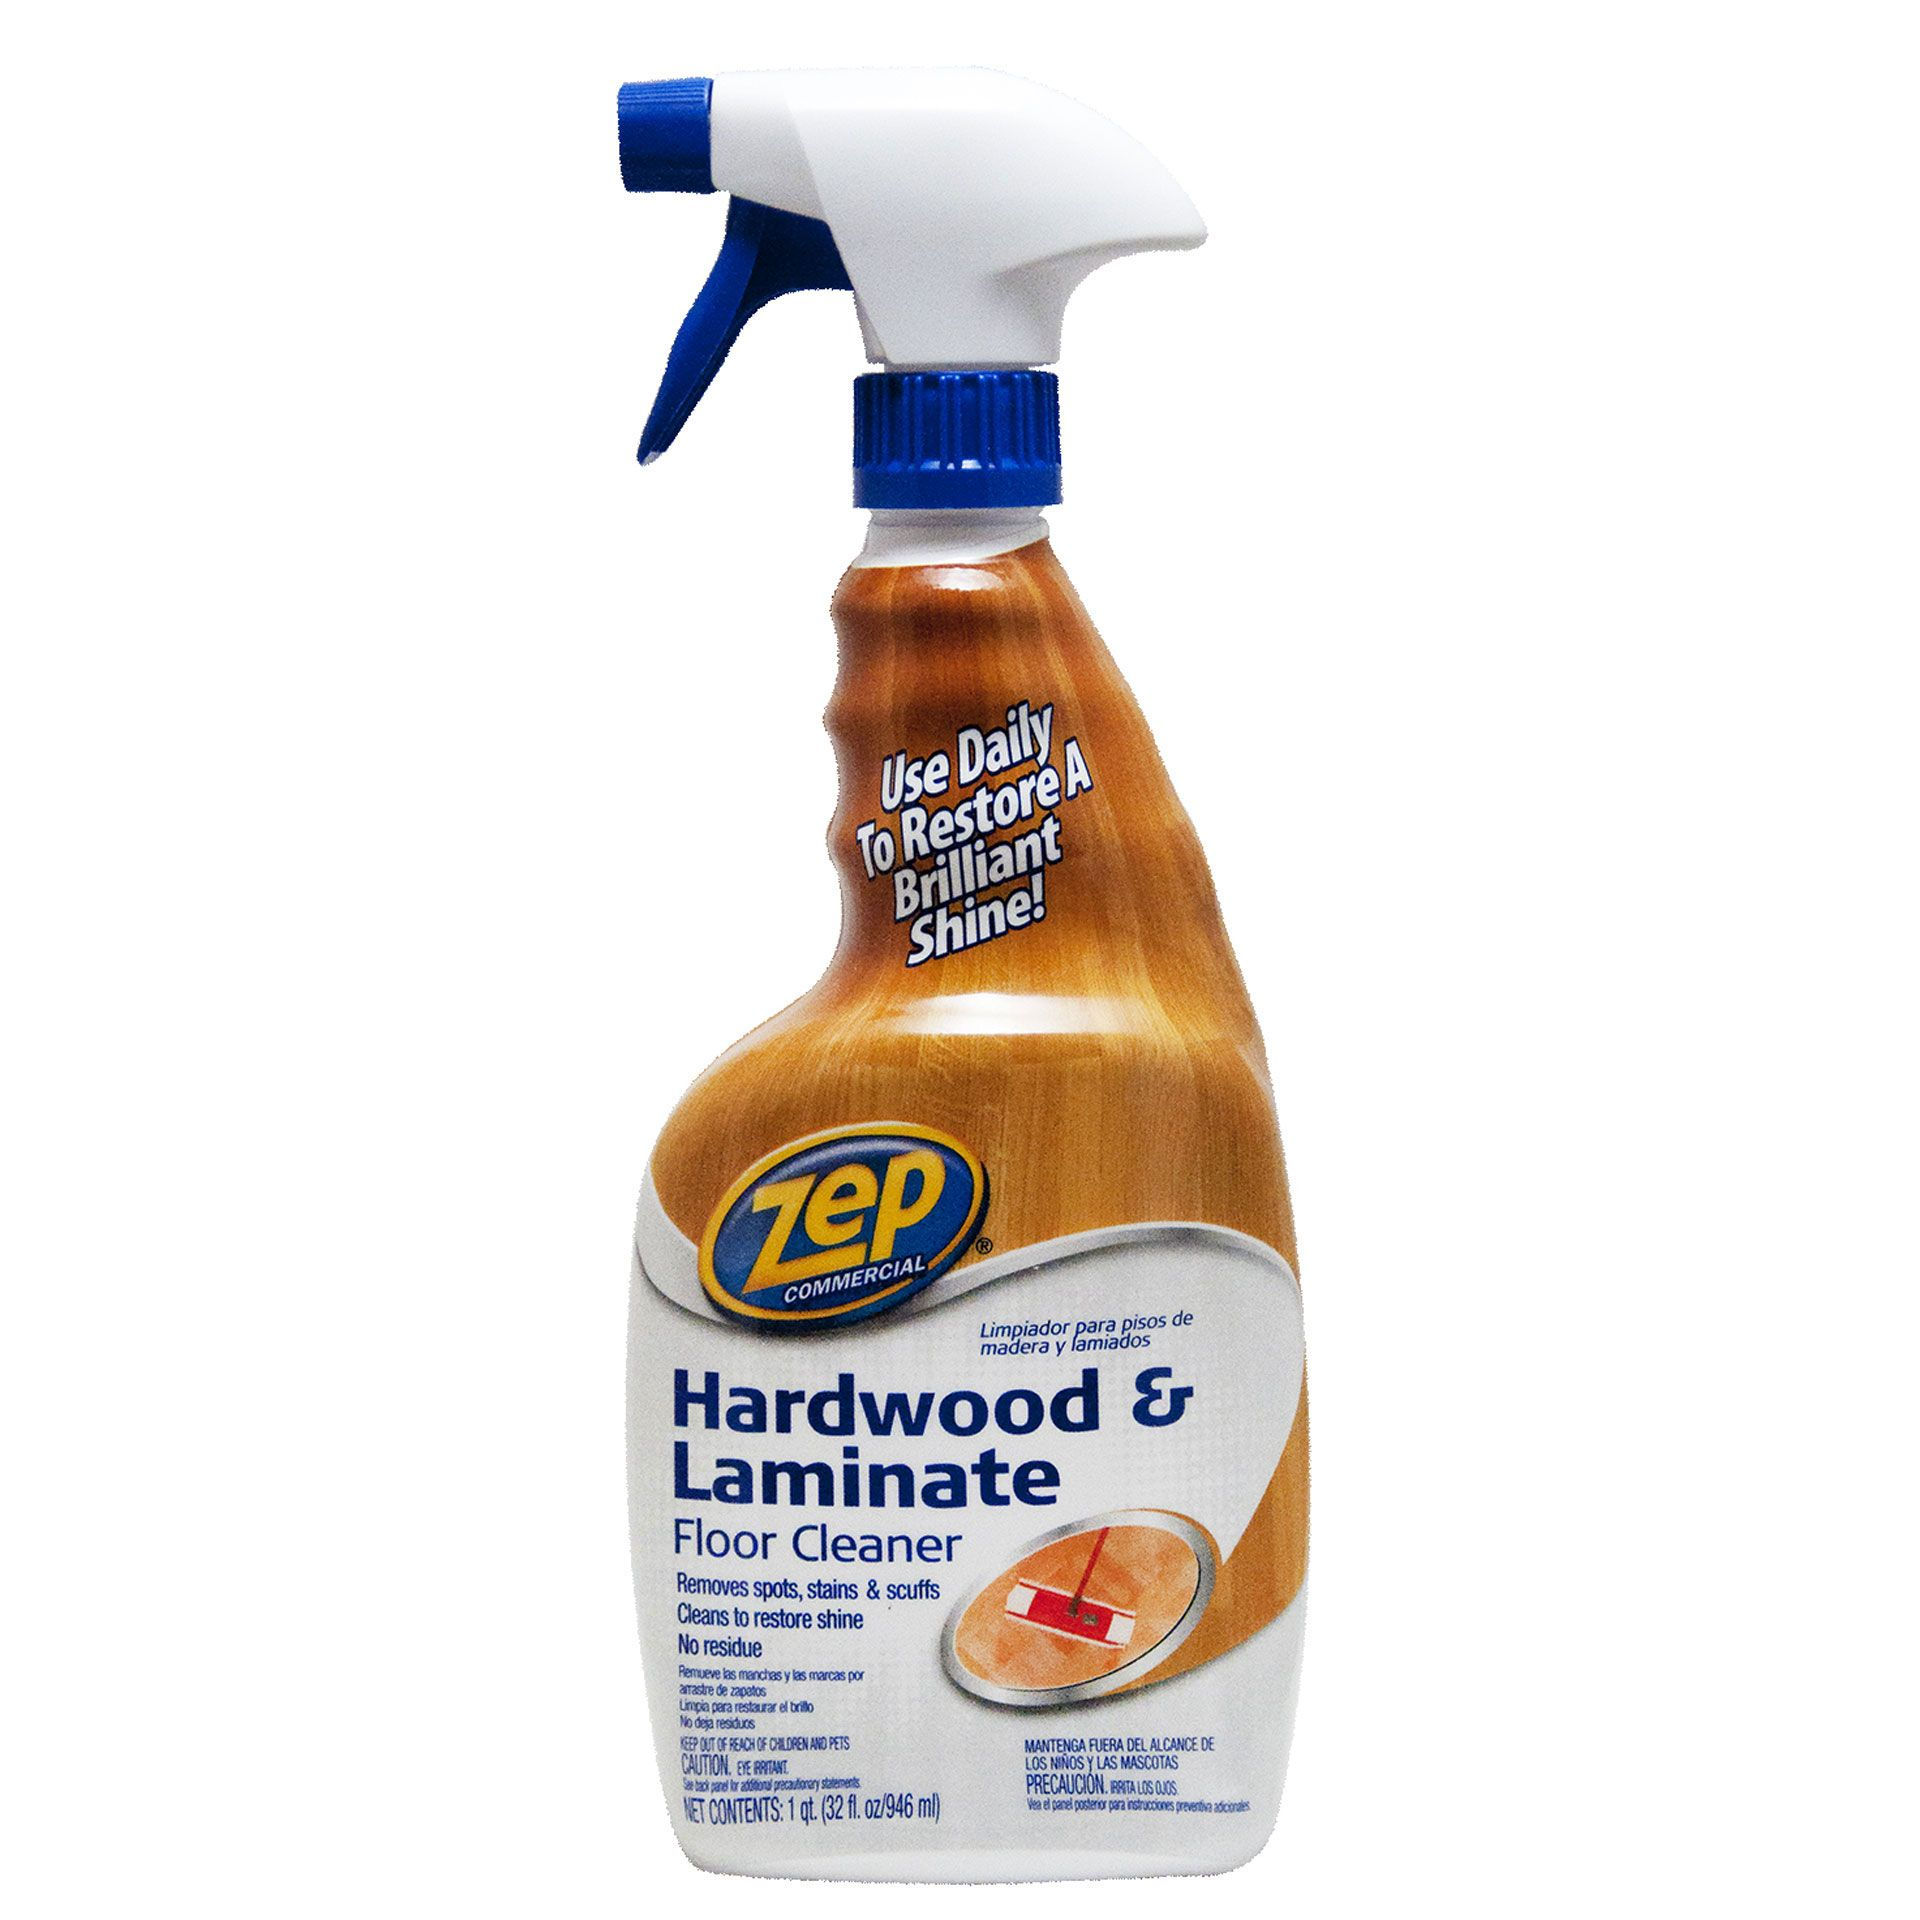 Amazing Laminate Cleaner S2 77331146 Rejuvenate Cleaner Sds Rejuvenate Cleaner Youtube 550094b8cdff2 Ghk Zep Commercial Hardwood houzz 01 Rejuvenate Floor Cleaner